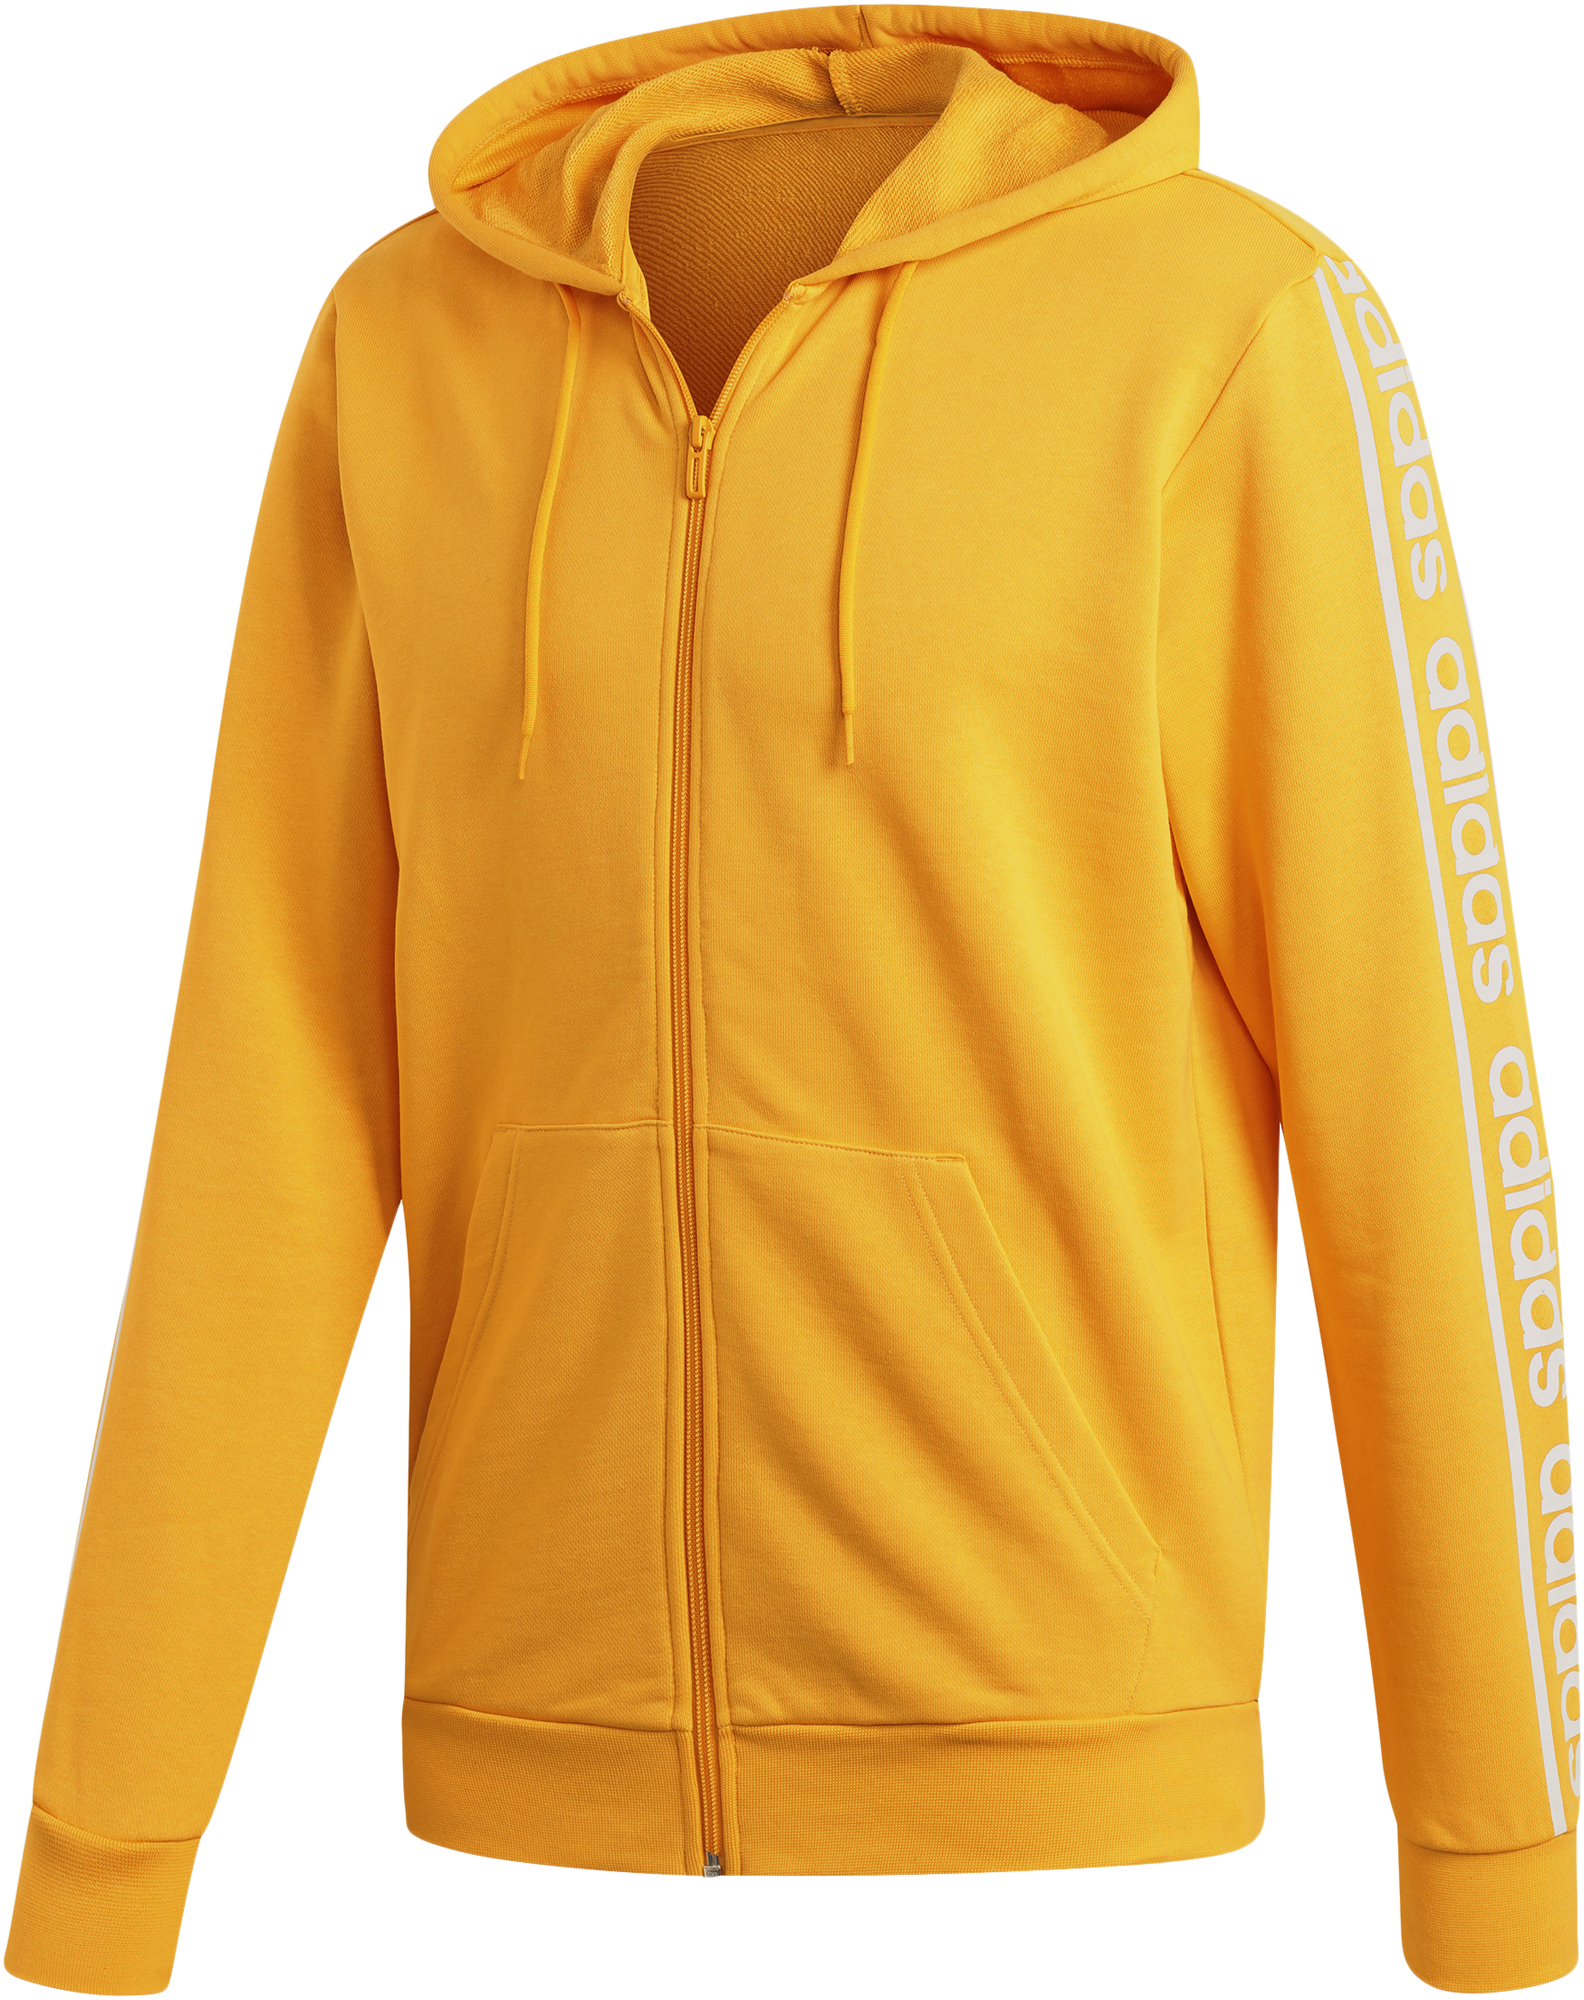 Adidas Толстовка мужская Adidas, размер 50